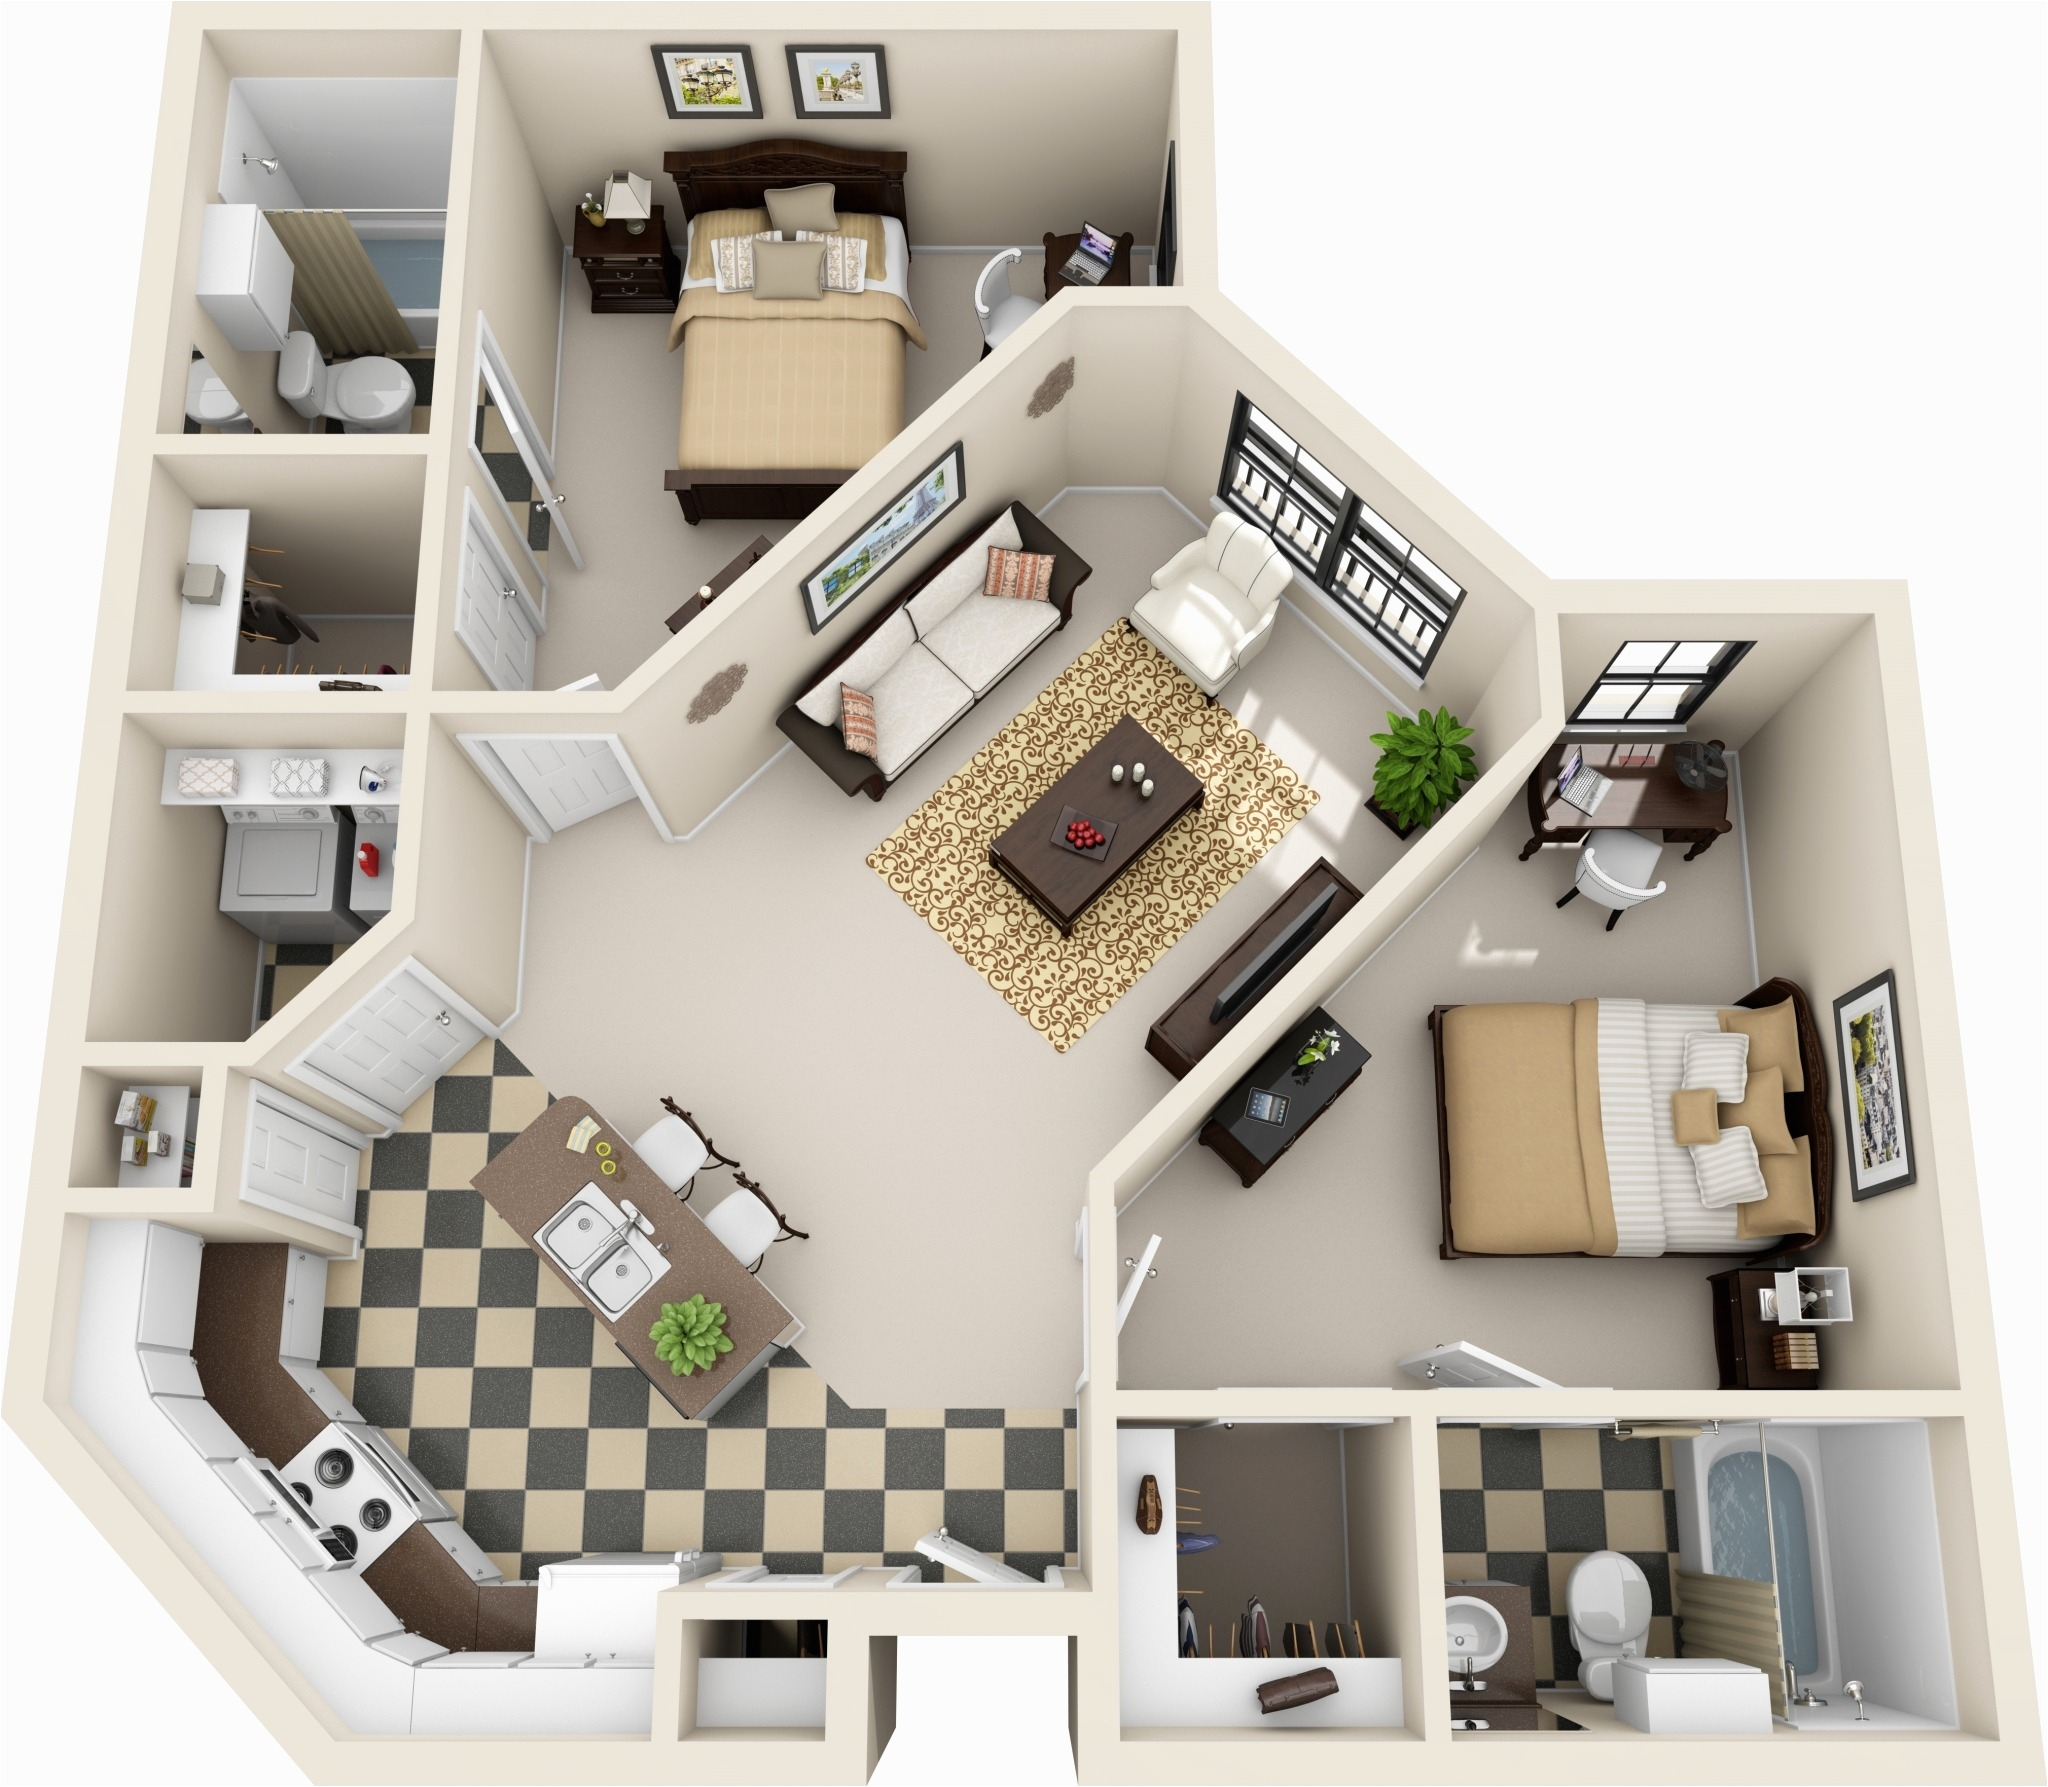 2 bedroom apartments gallery 2 bed 2 bath 2 bed 2 bath apartment in baton rouge la